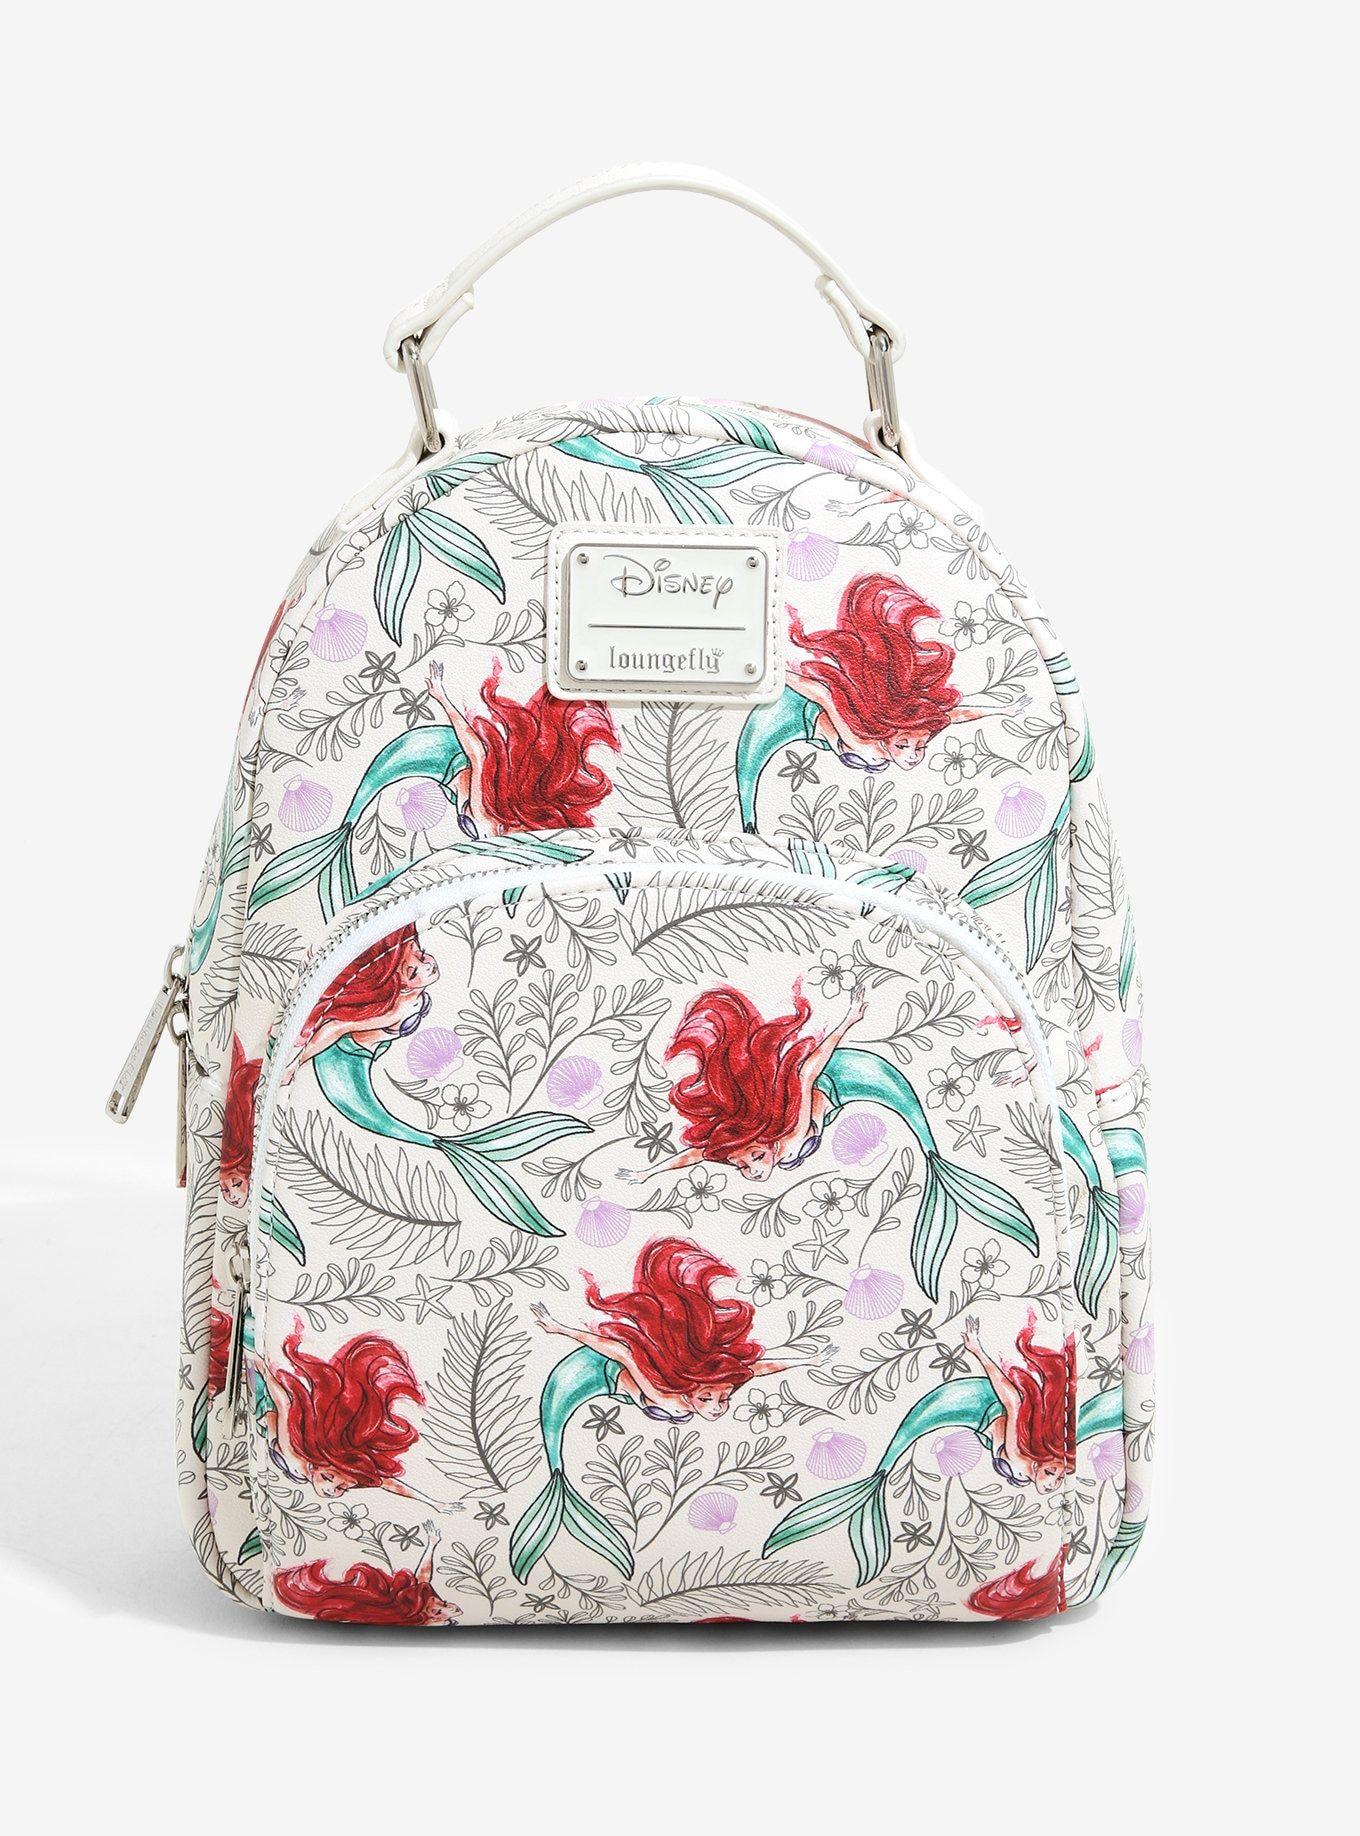 Loungefly Disney Little Mermaid Mini Backpack